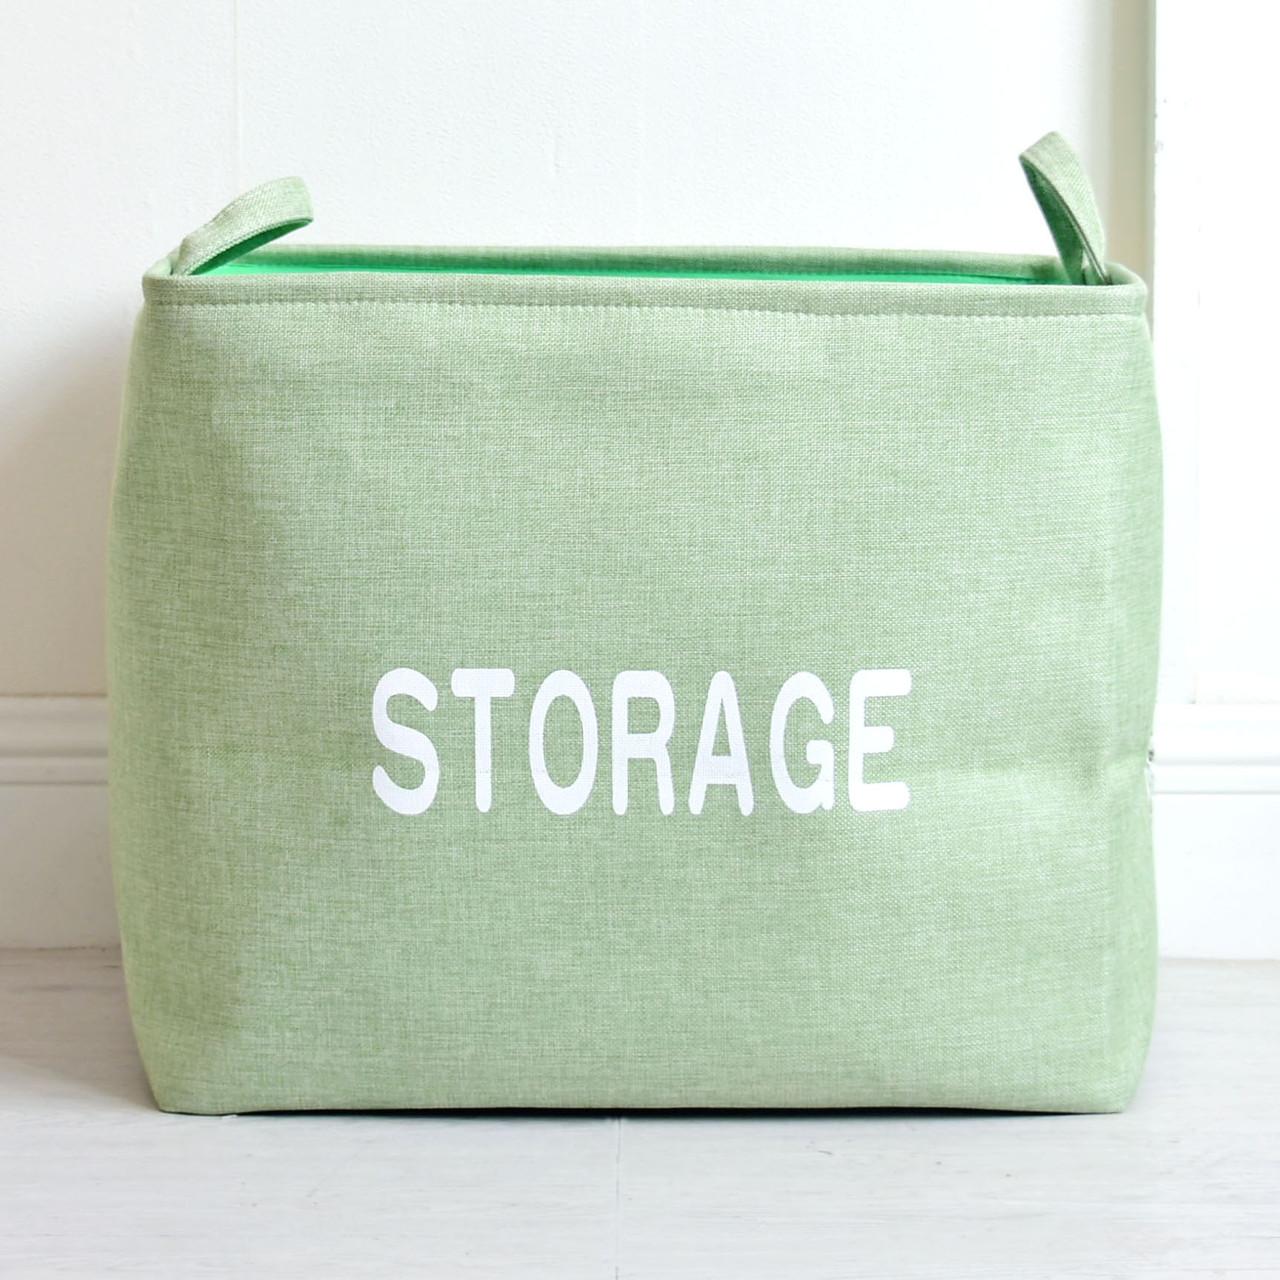 Корзина для игрушек Storage green Berni (22031)